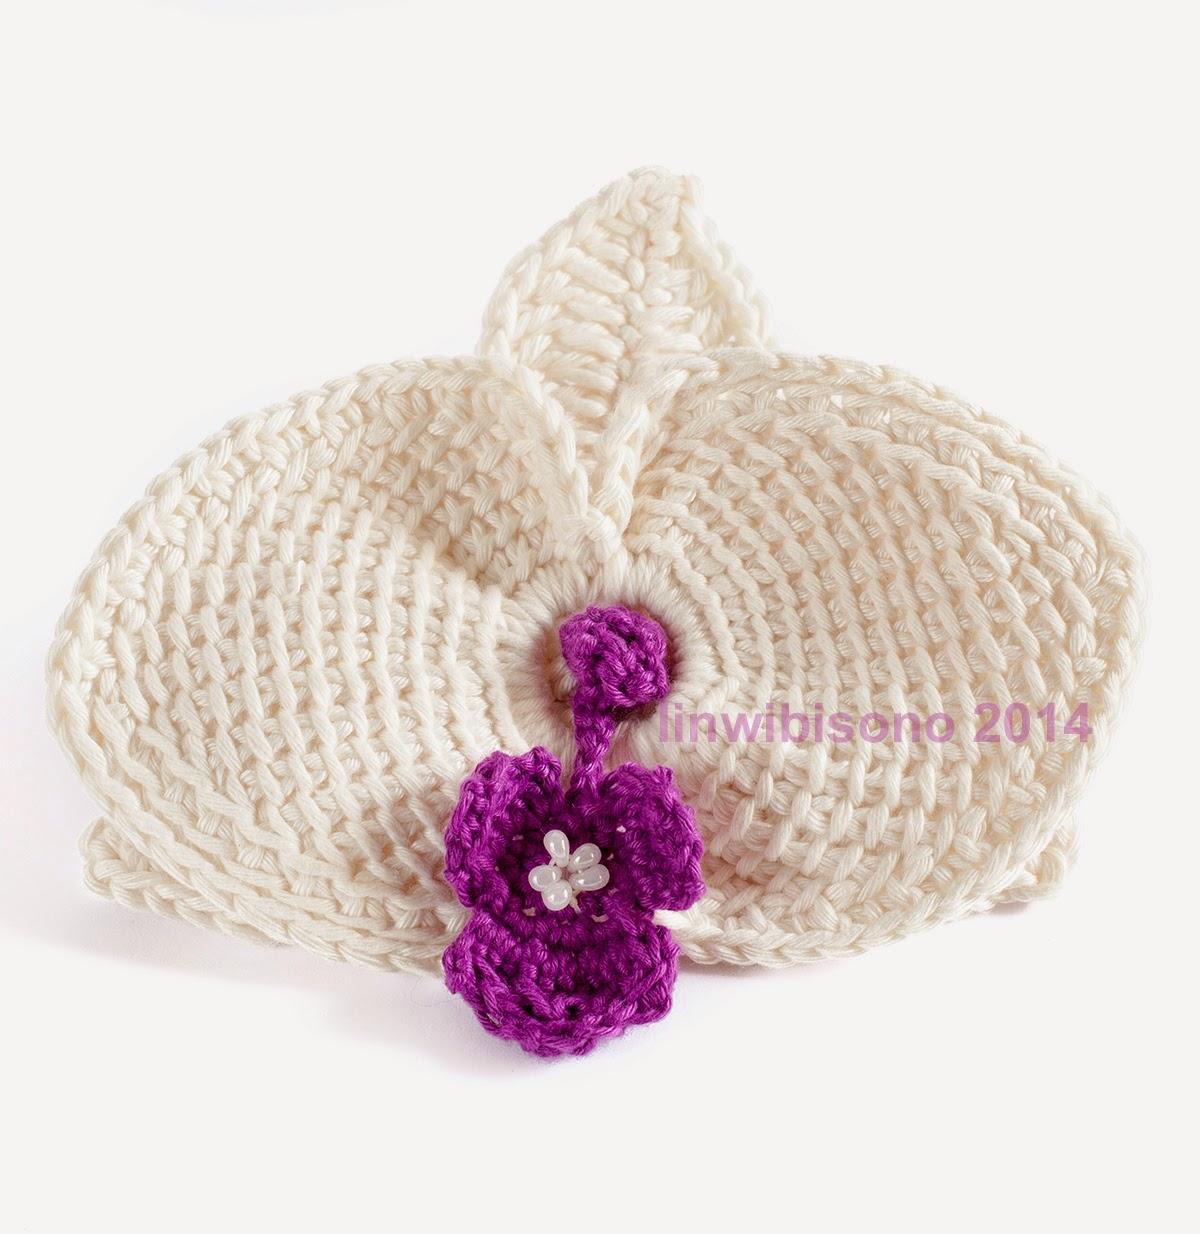 Crochet orchid flower pattern squareone for 17 crochet rockstar one flower a week 1 ccuart Gallery